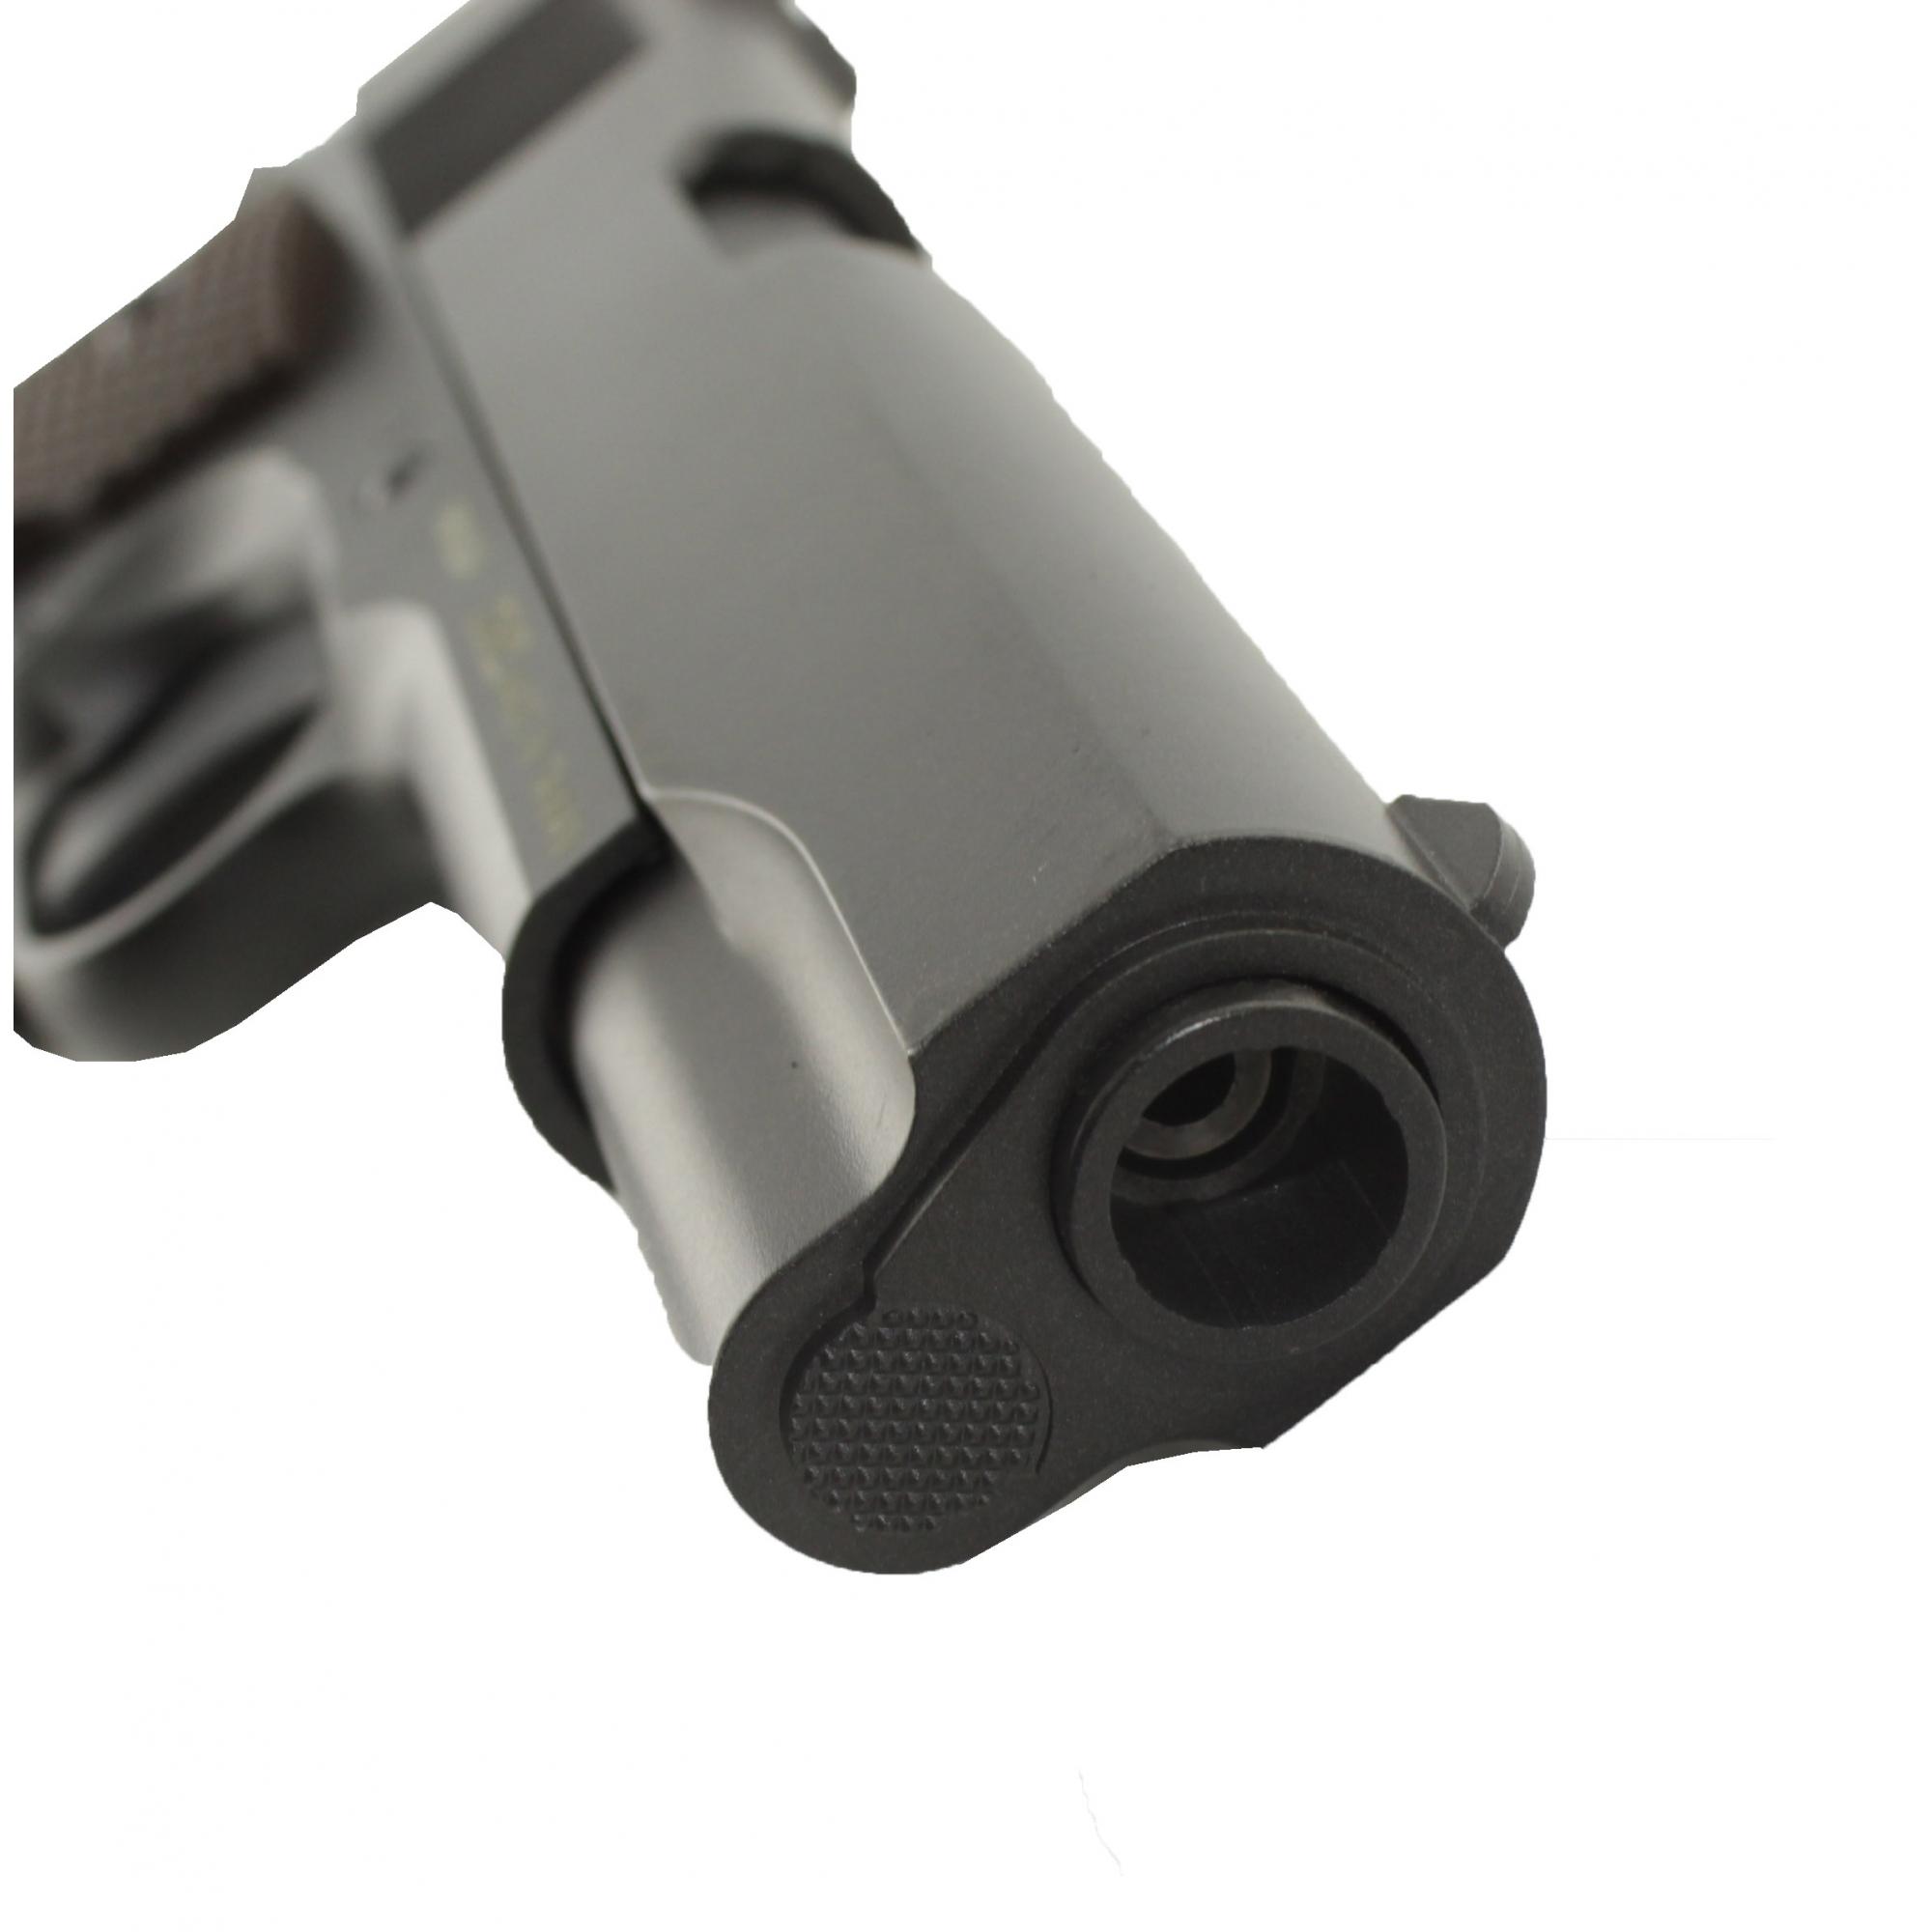 Pistola de Pressão KWC M1911 Chumbinho 4,5mm